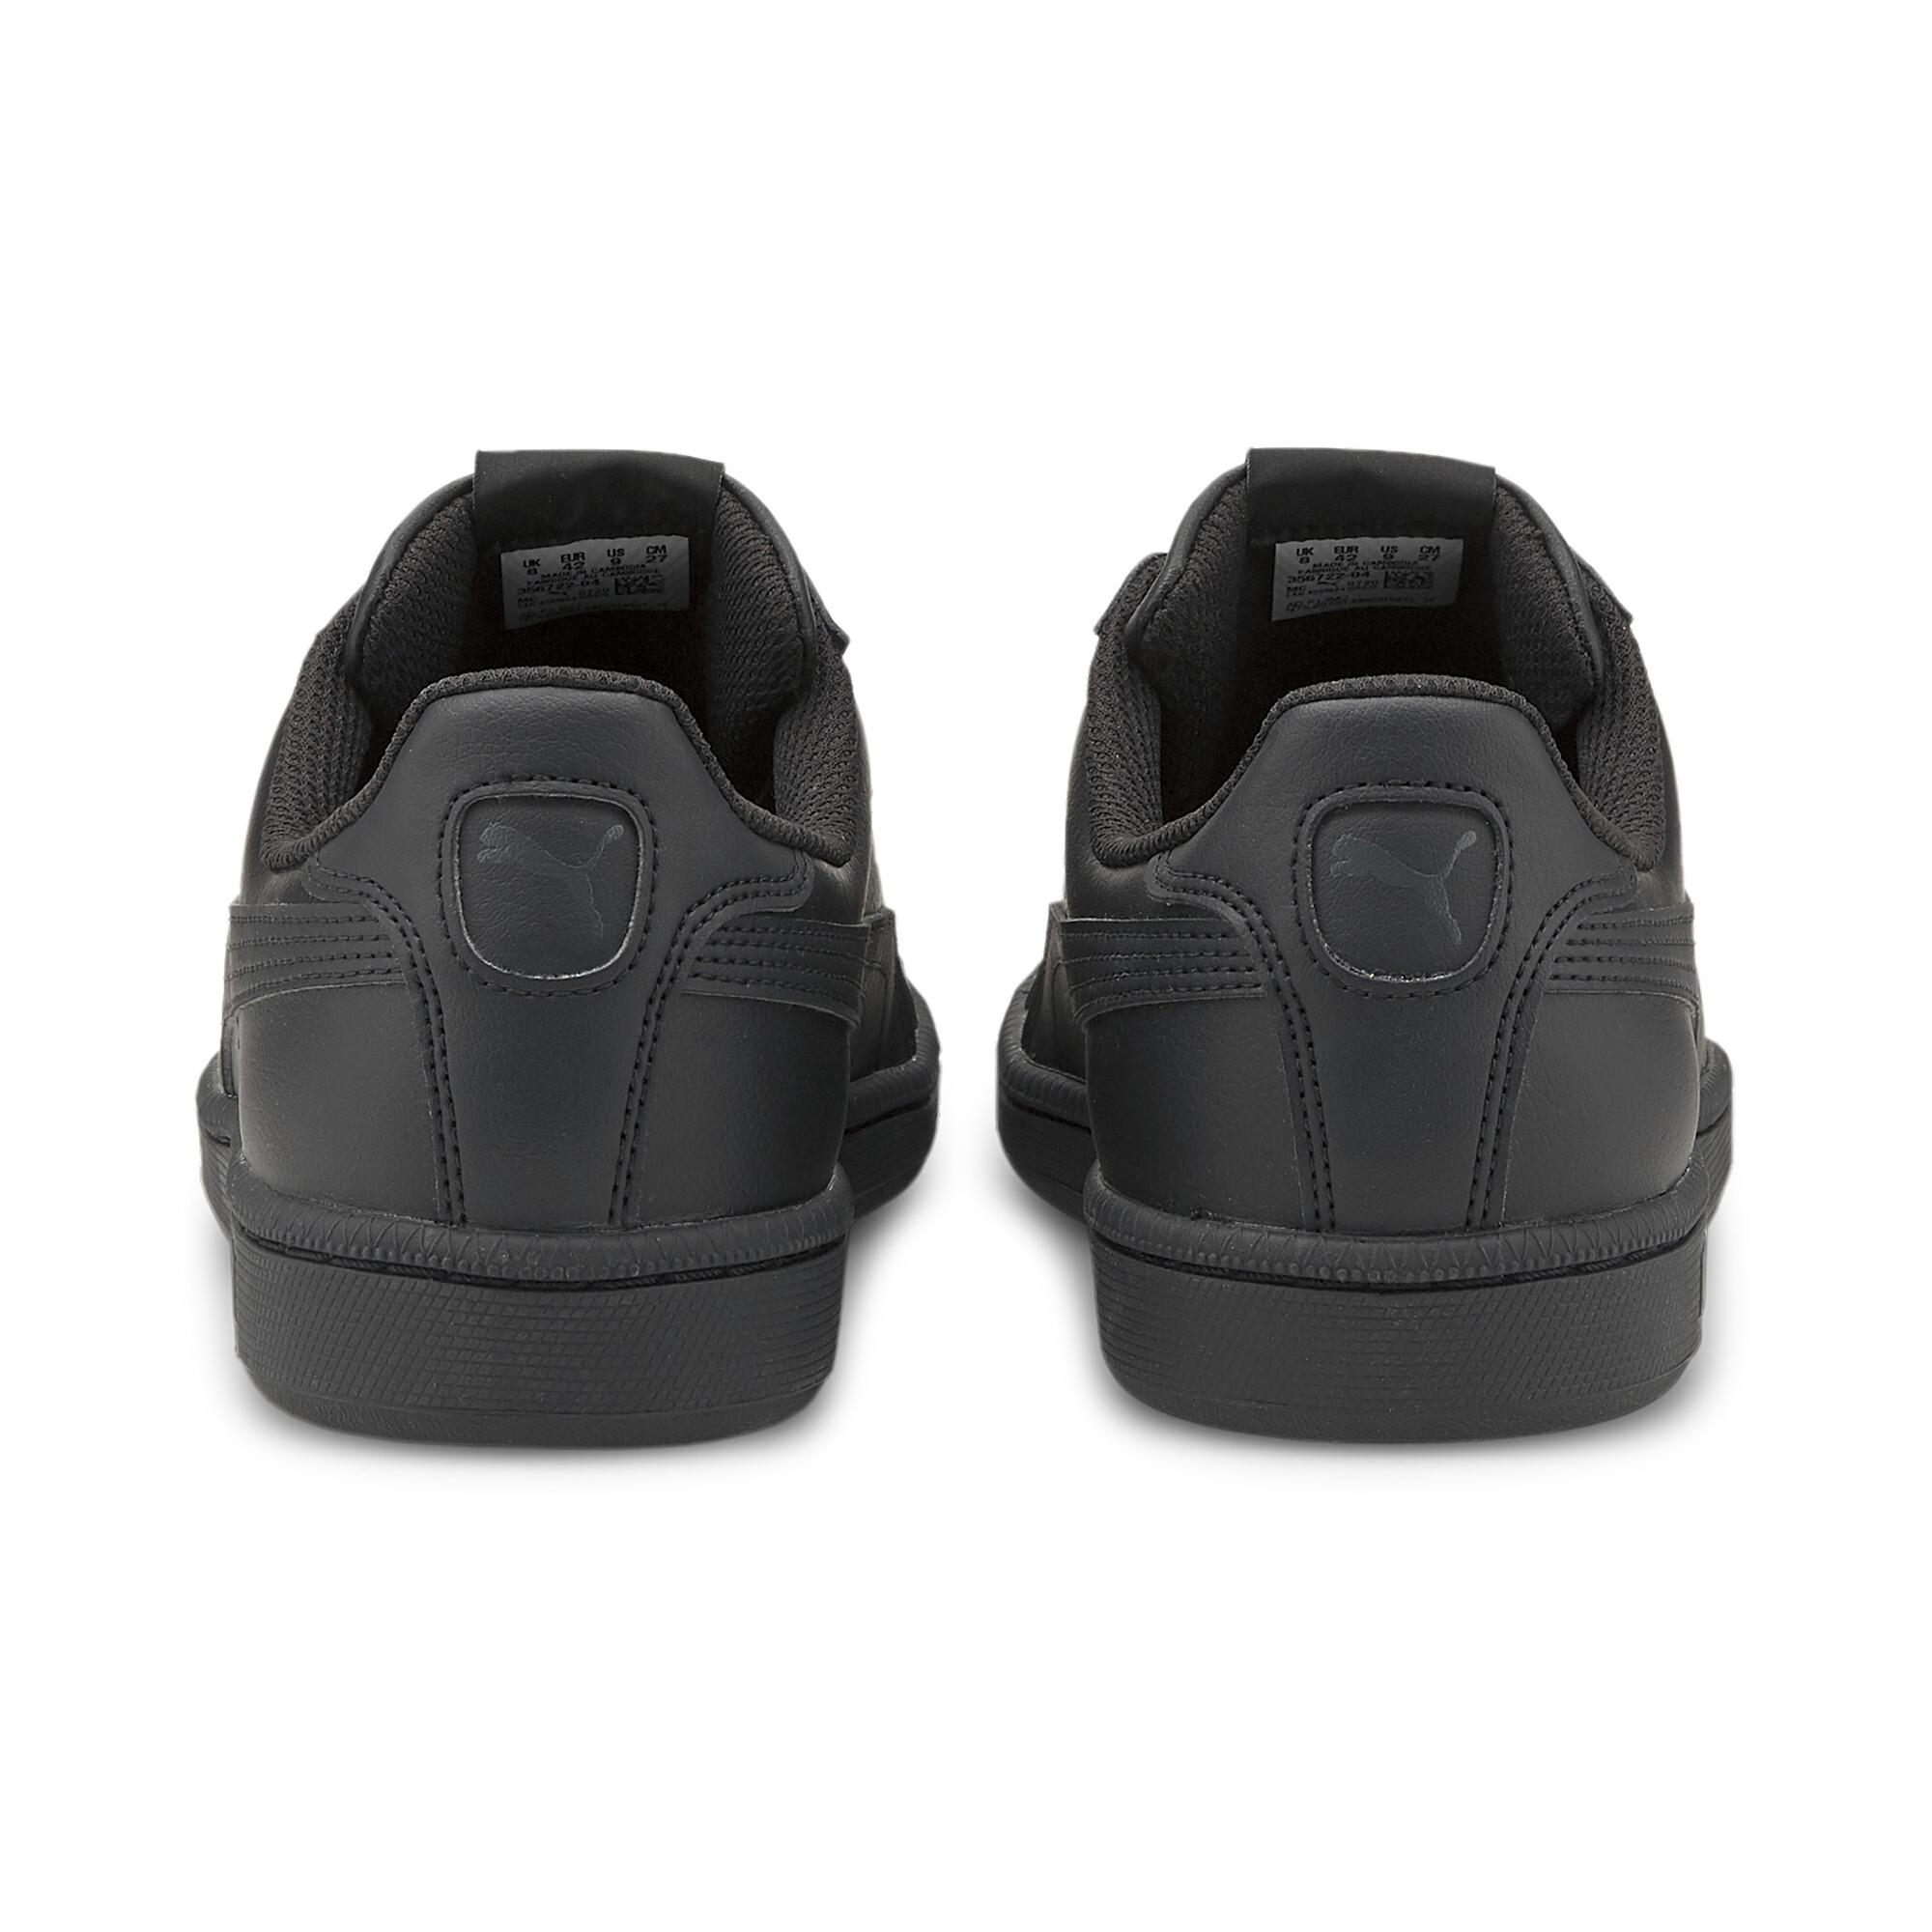 Indexbild 3 - PUMA Smash Trainers Schuhe Sneakers Sport Classics Unisex Neu